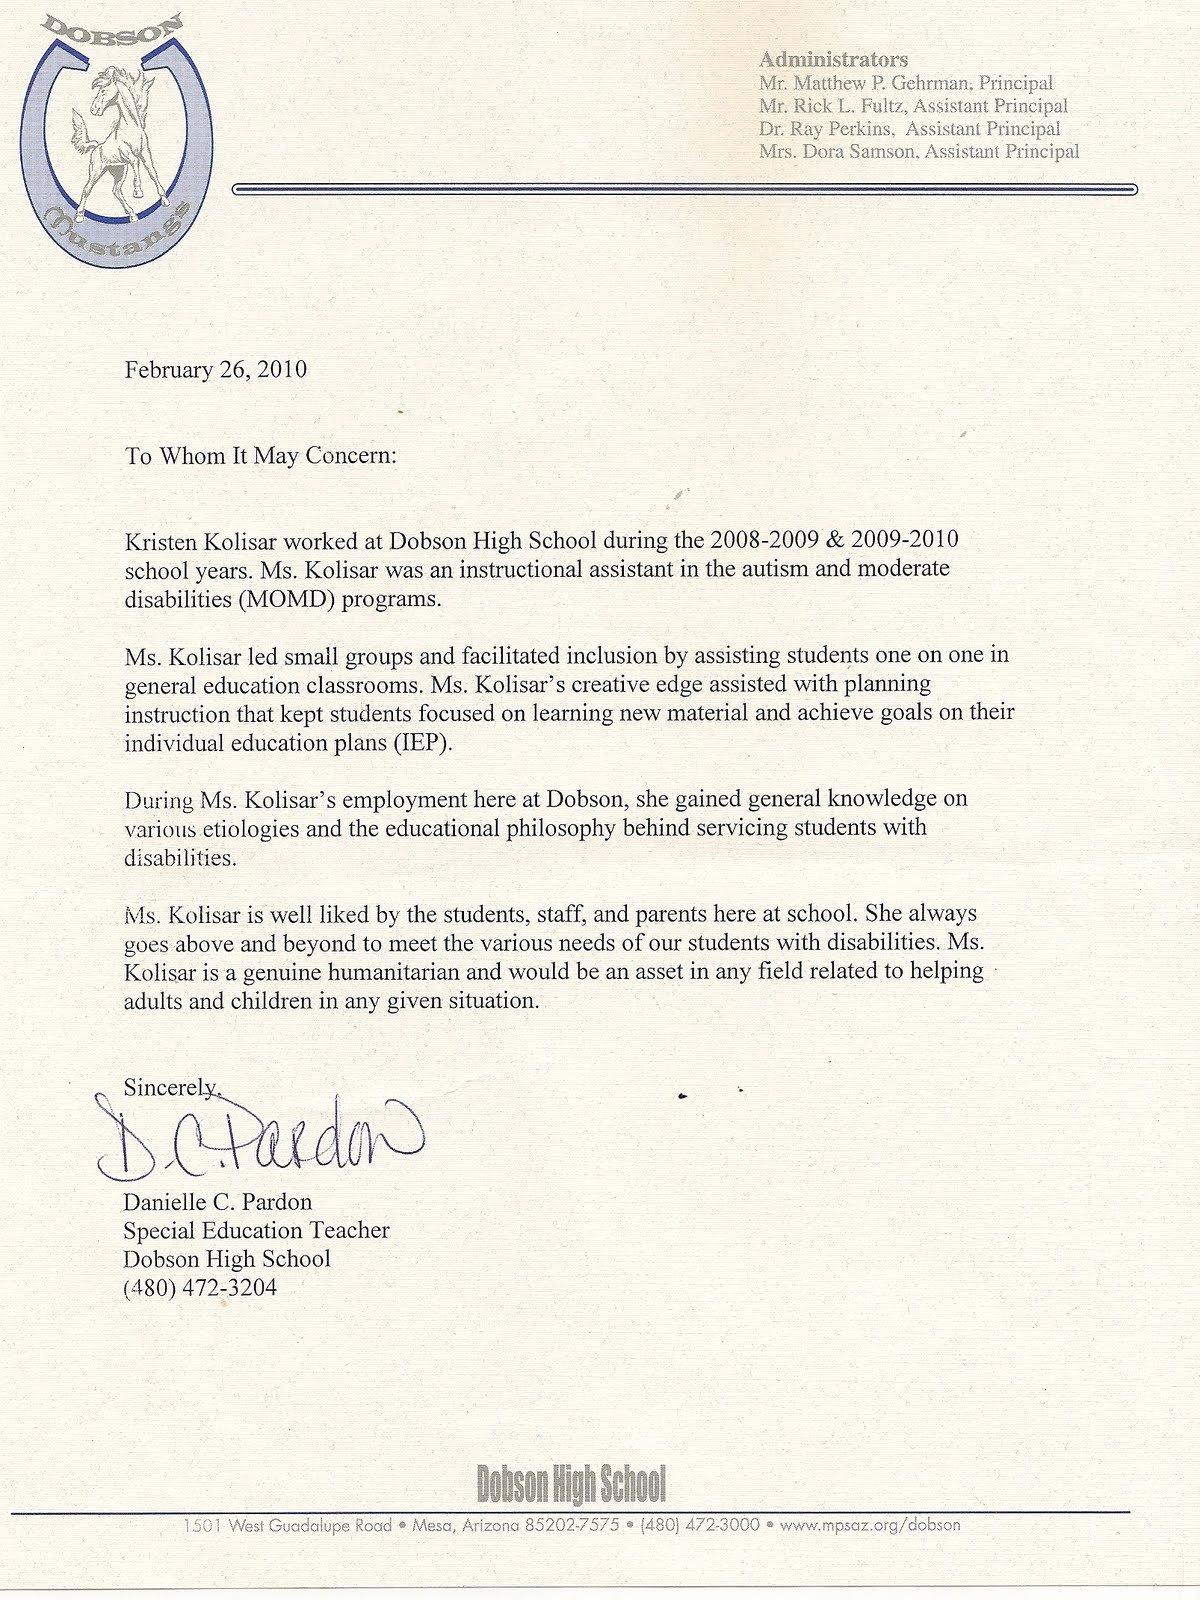 Pardon Letters Samples Best Of Bis401 Internship